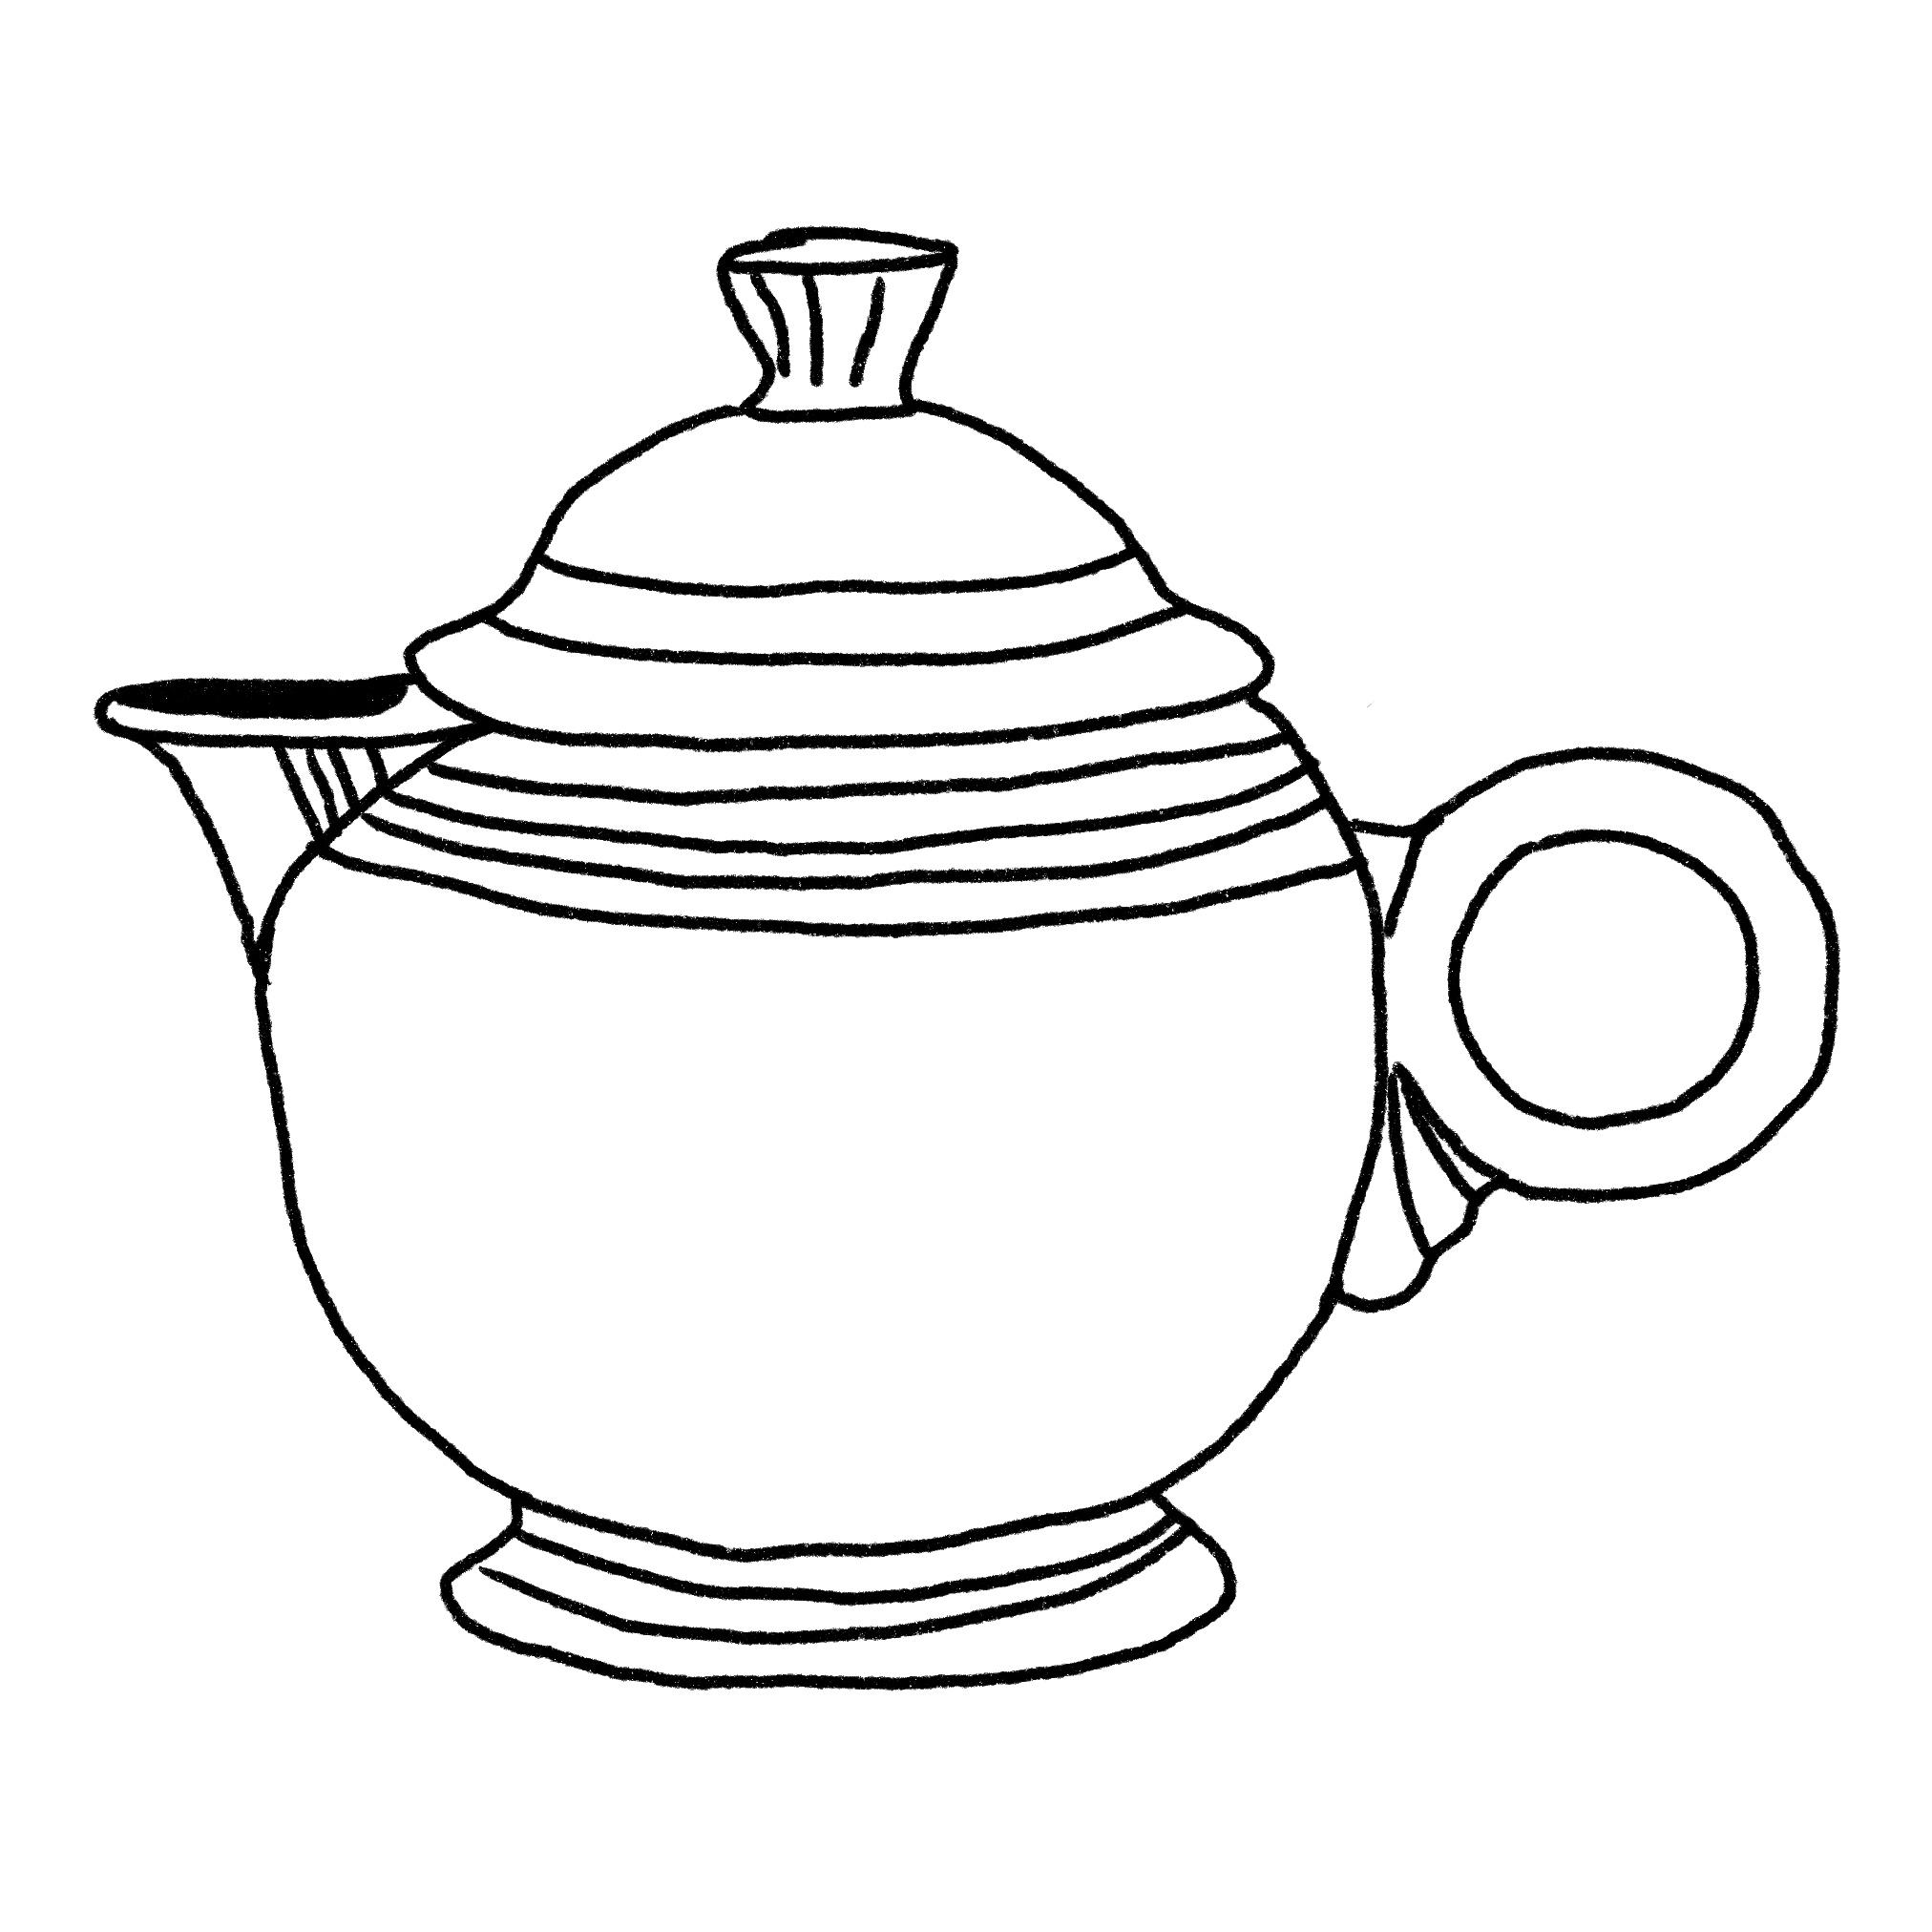 Illustration of a teapot